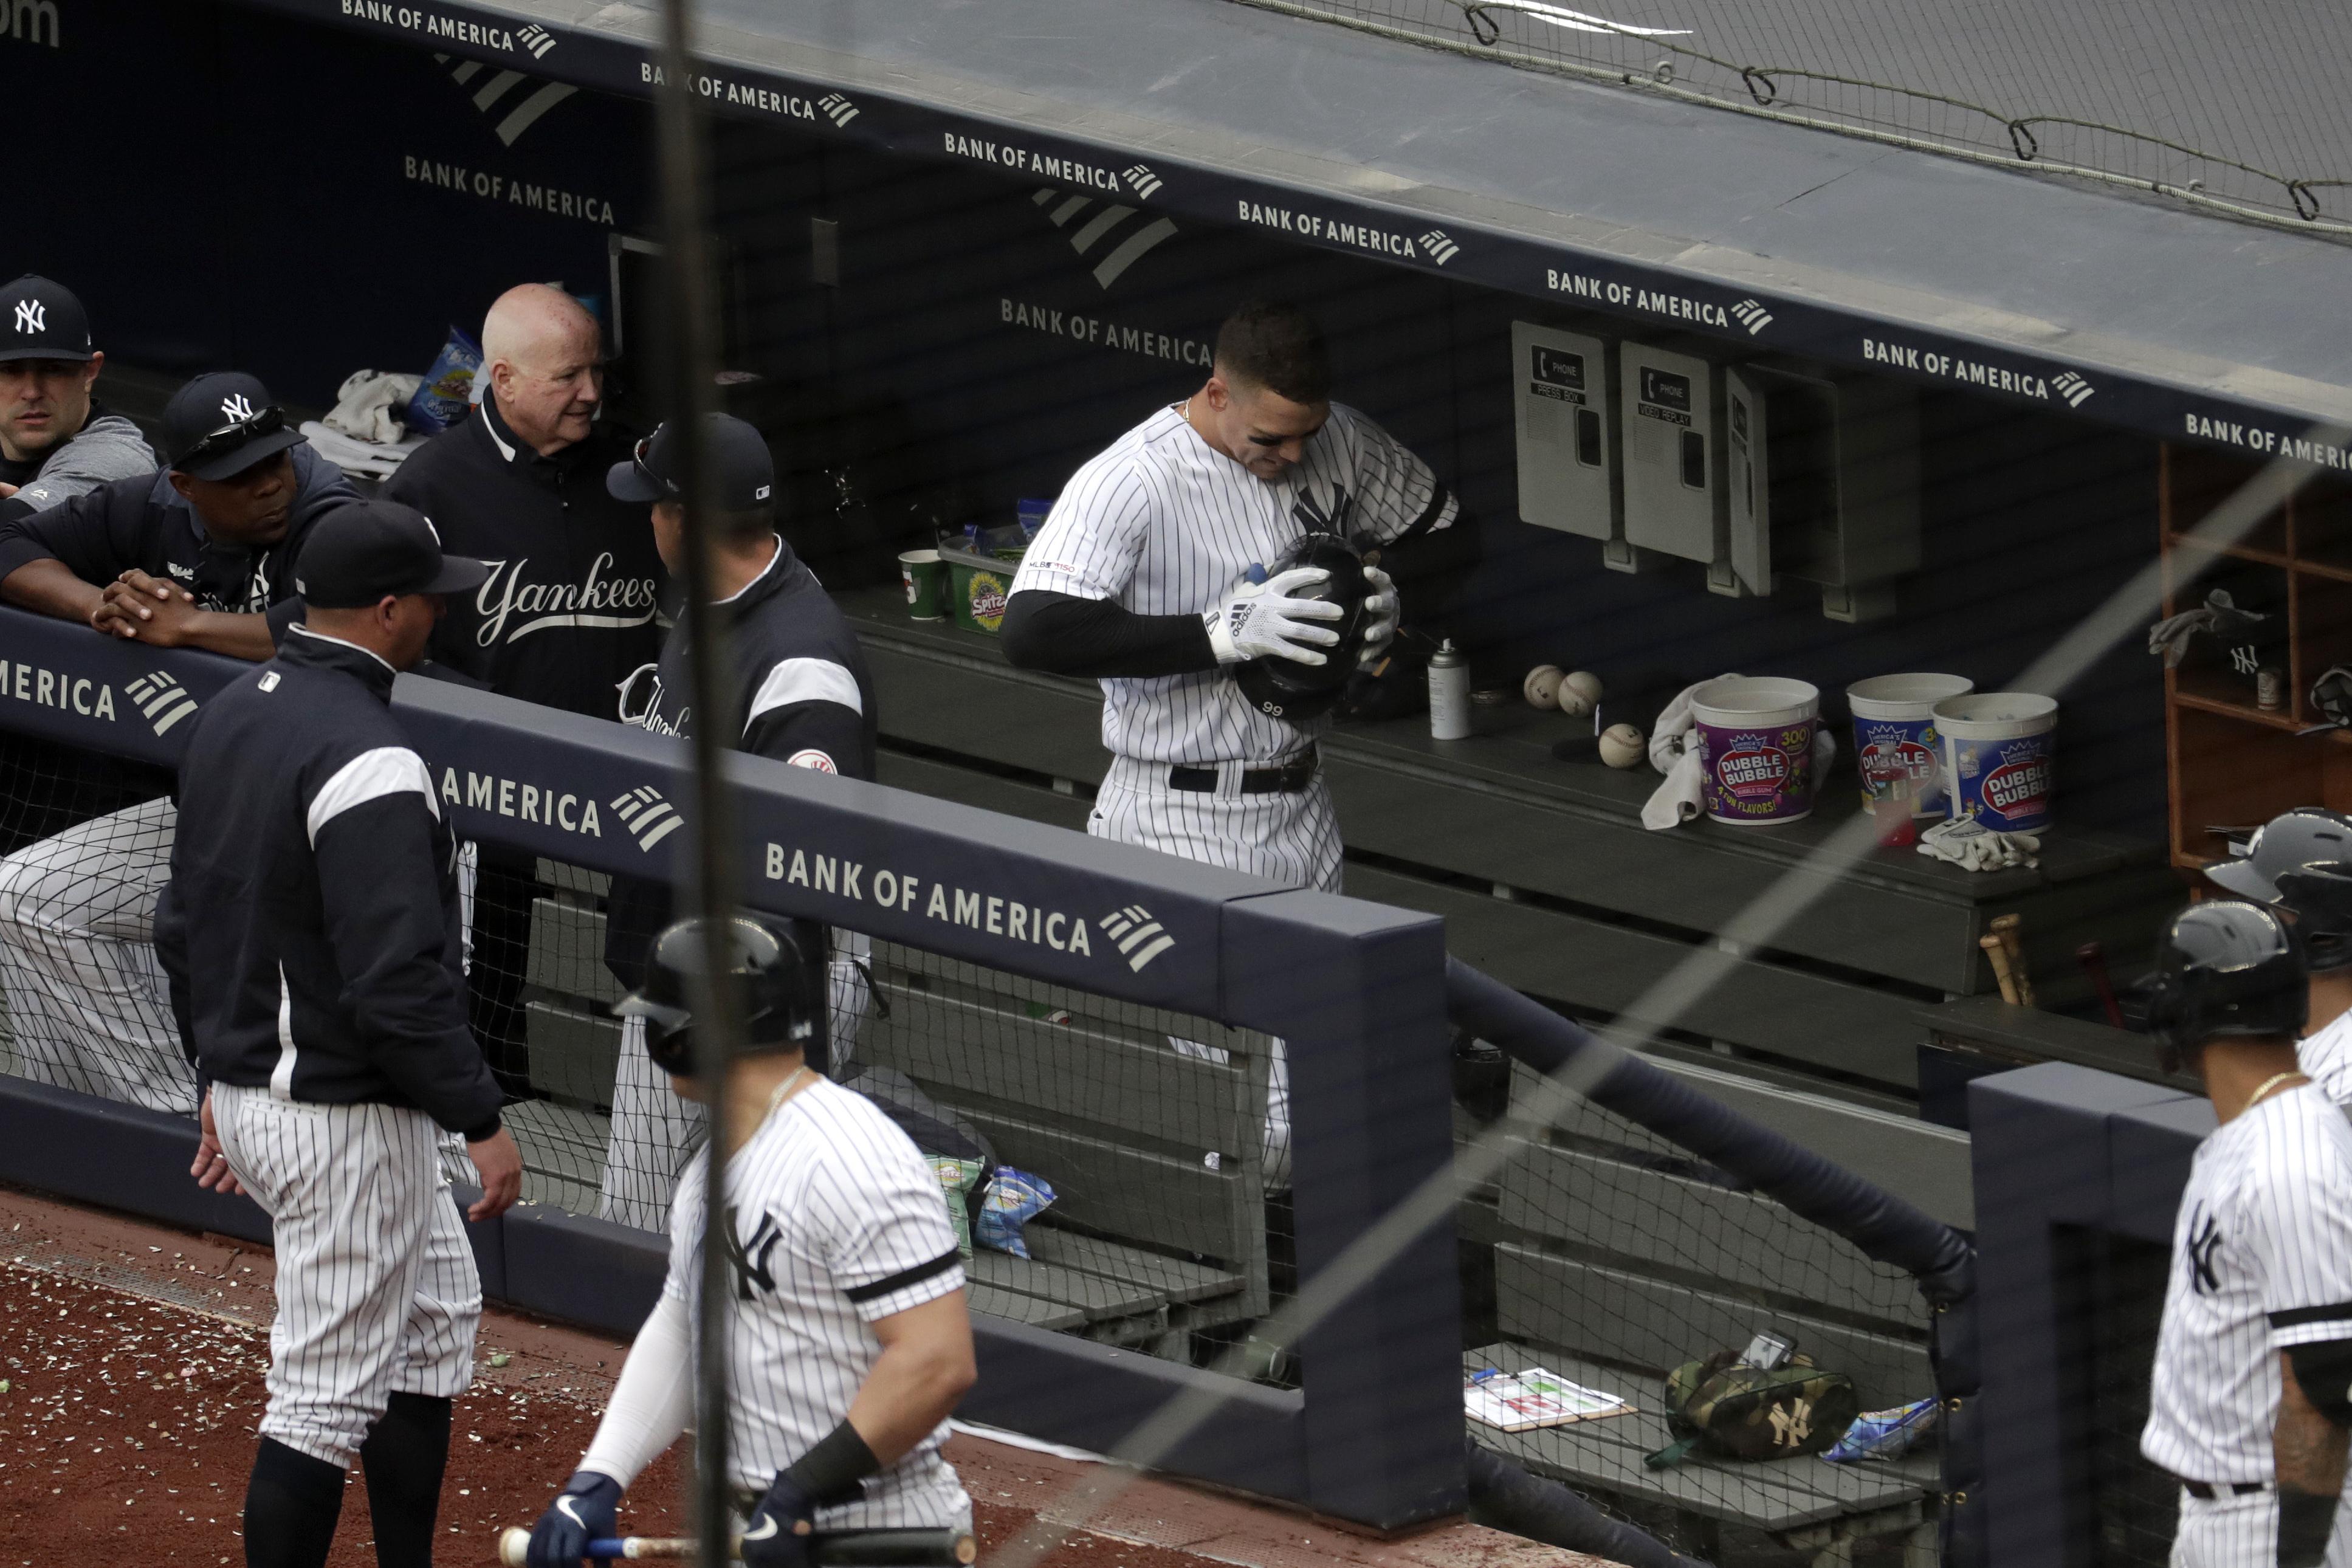 LEADING OFF: Yanks star Judge hurt, Cubs ace Lester close